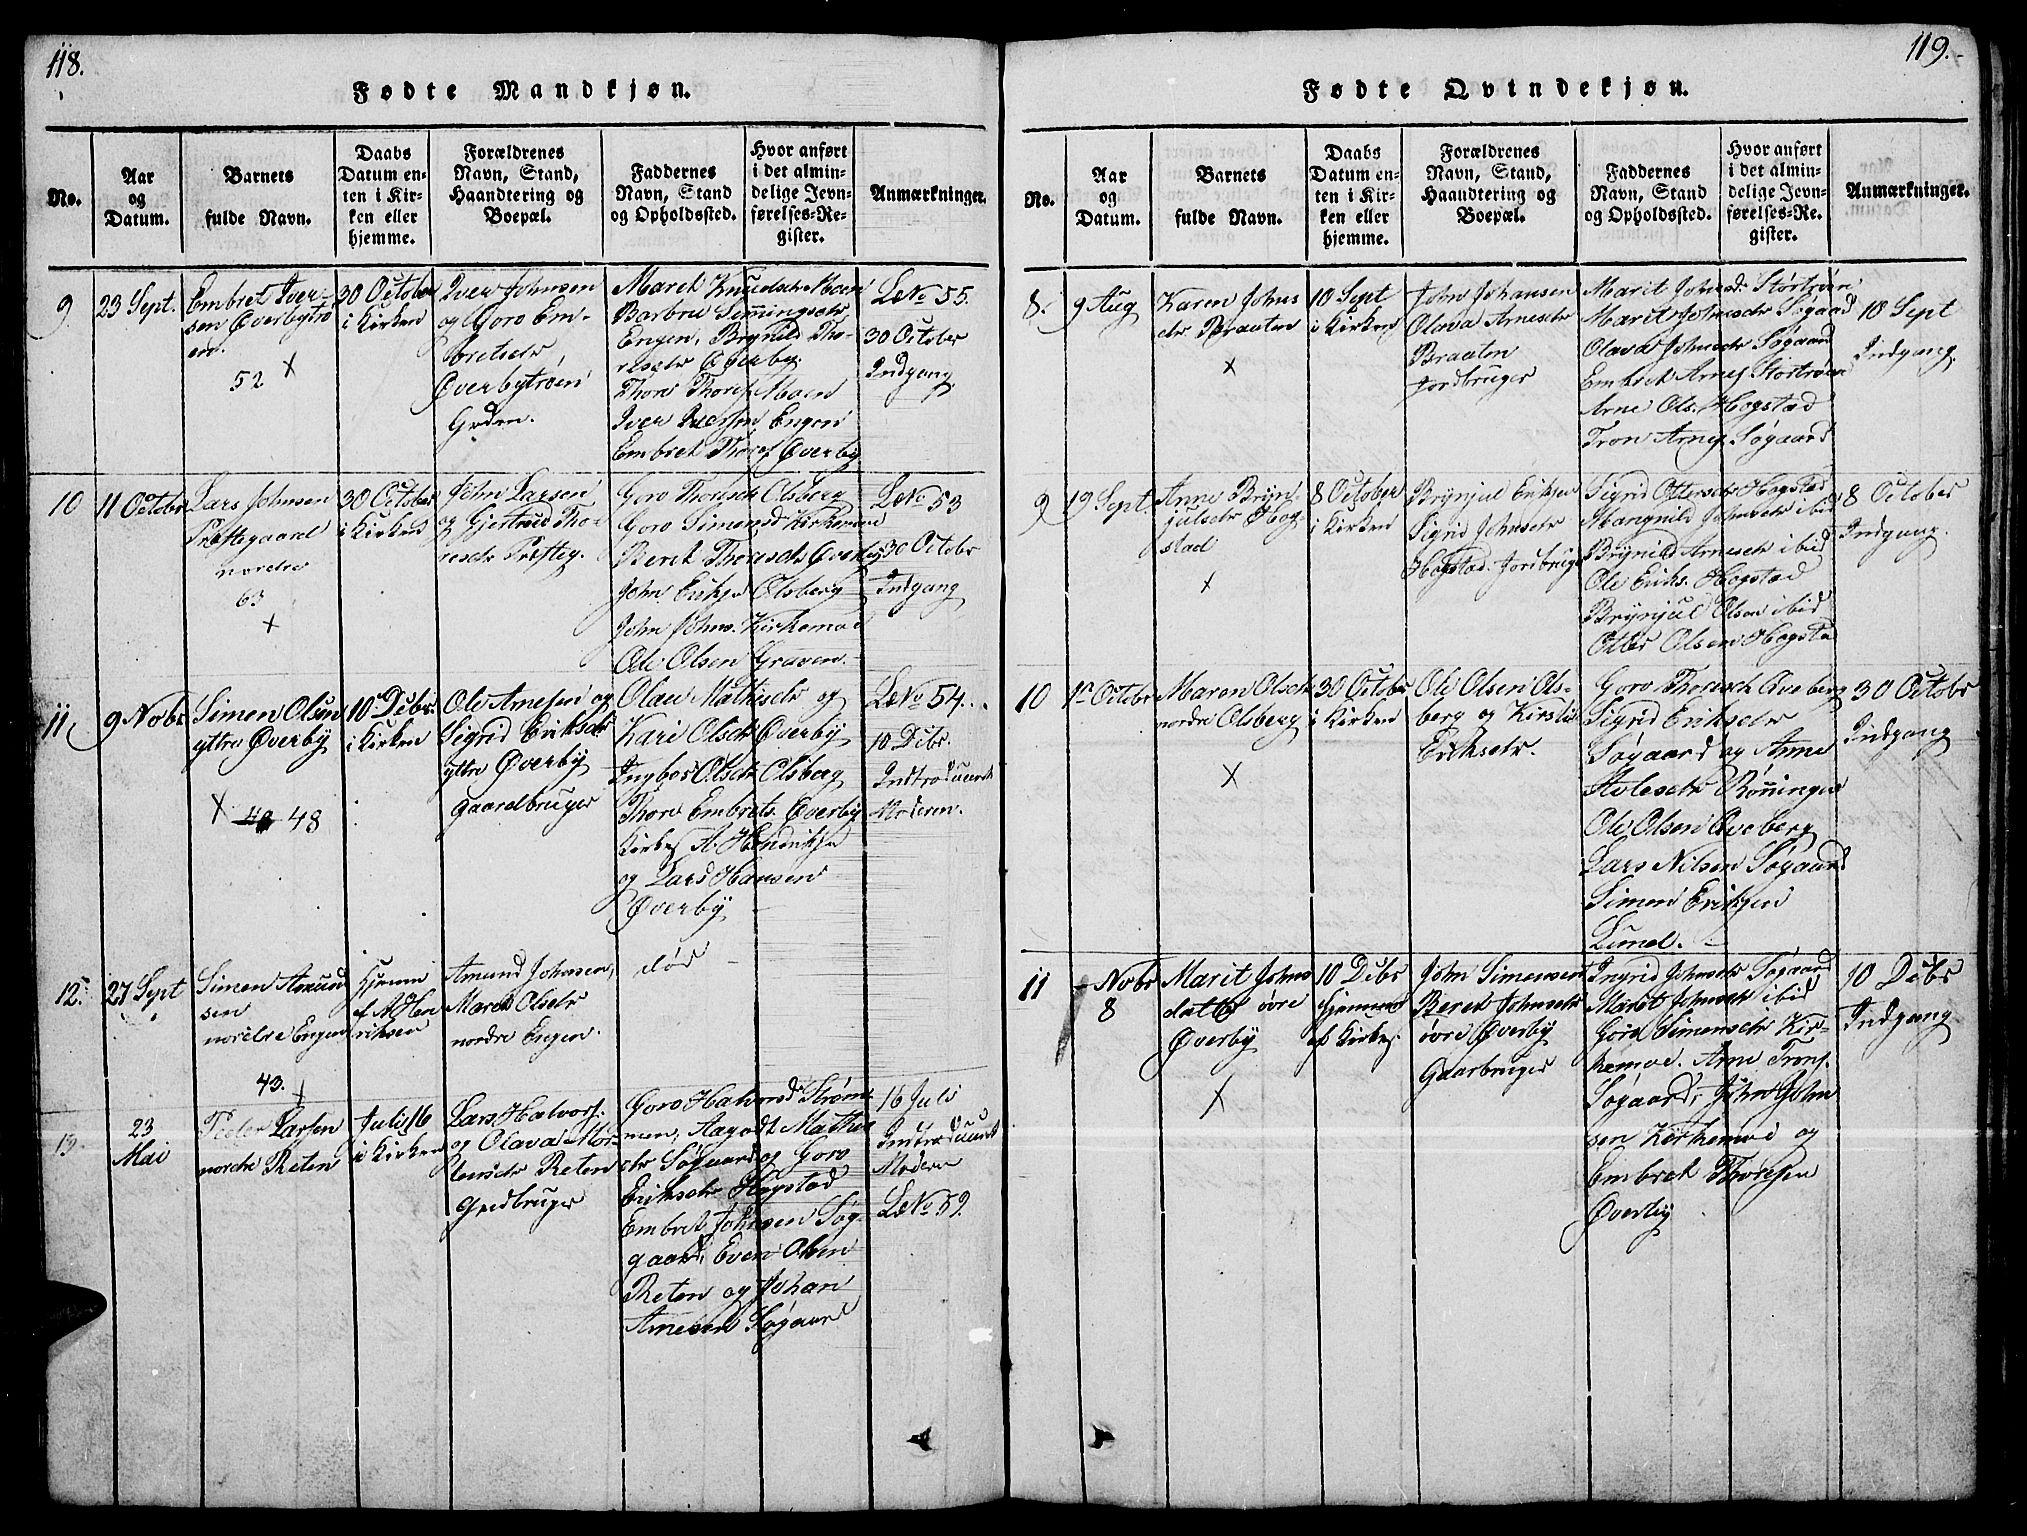 SAH, Tynset prestekontor, Klokkerbok nr. 4, 1814-1879, s. 118-119